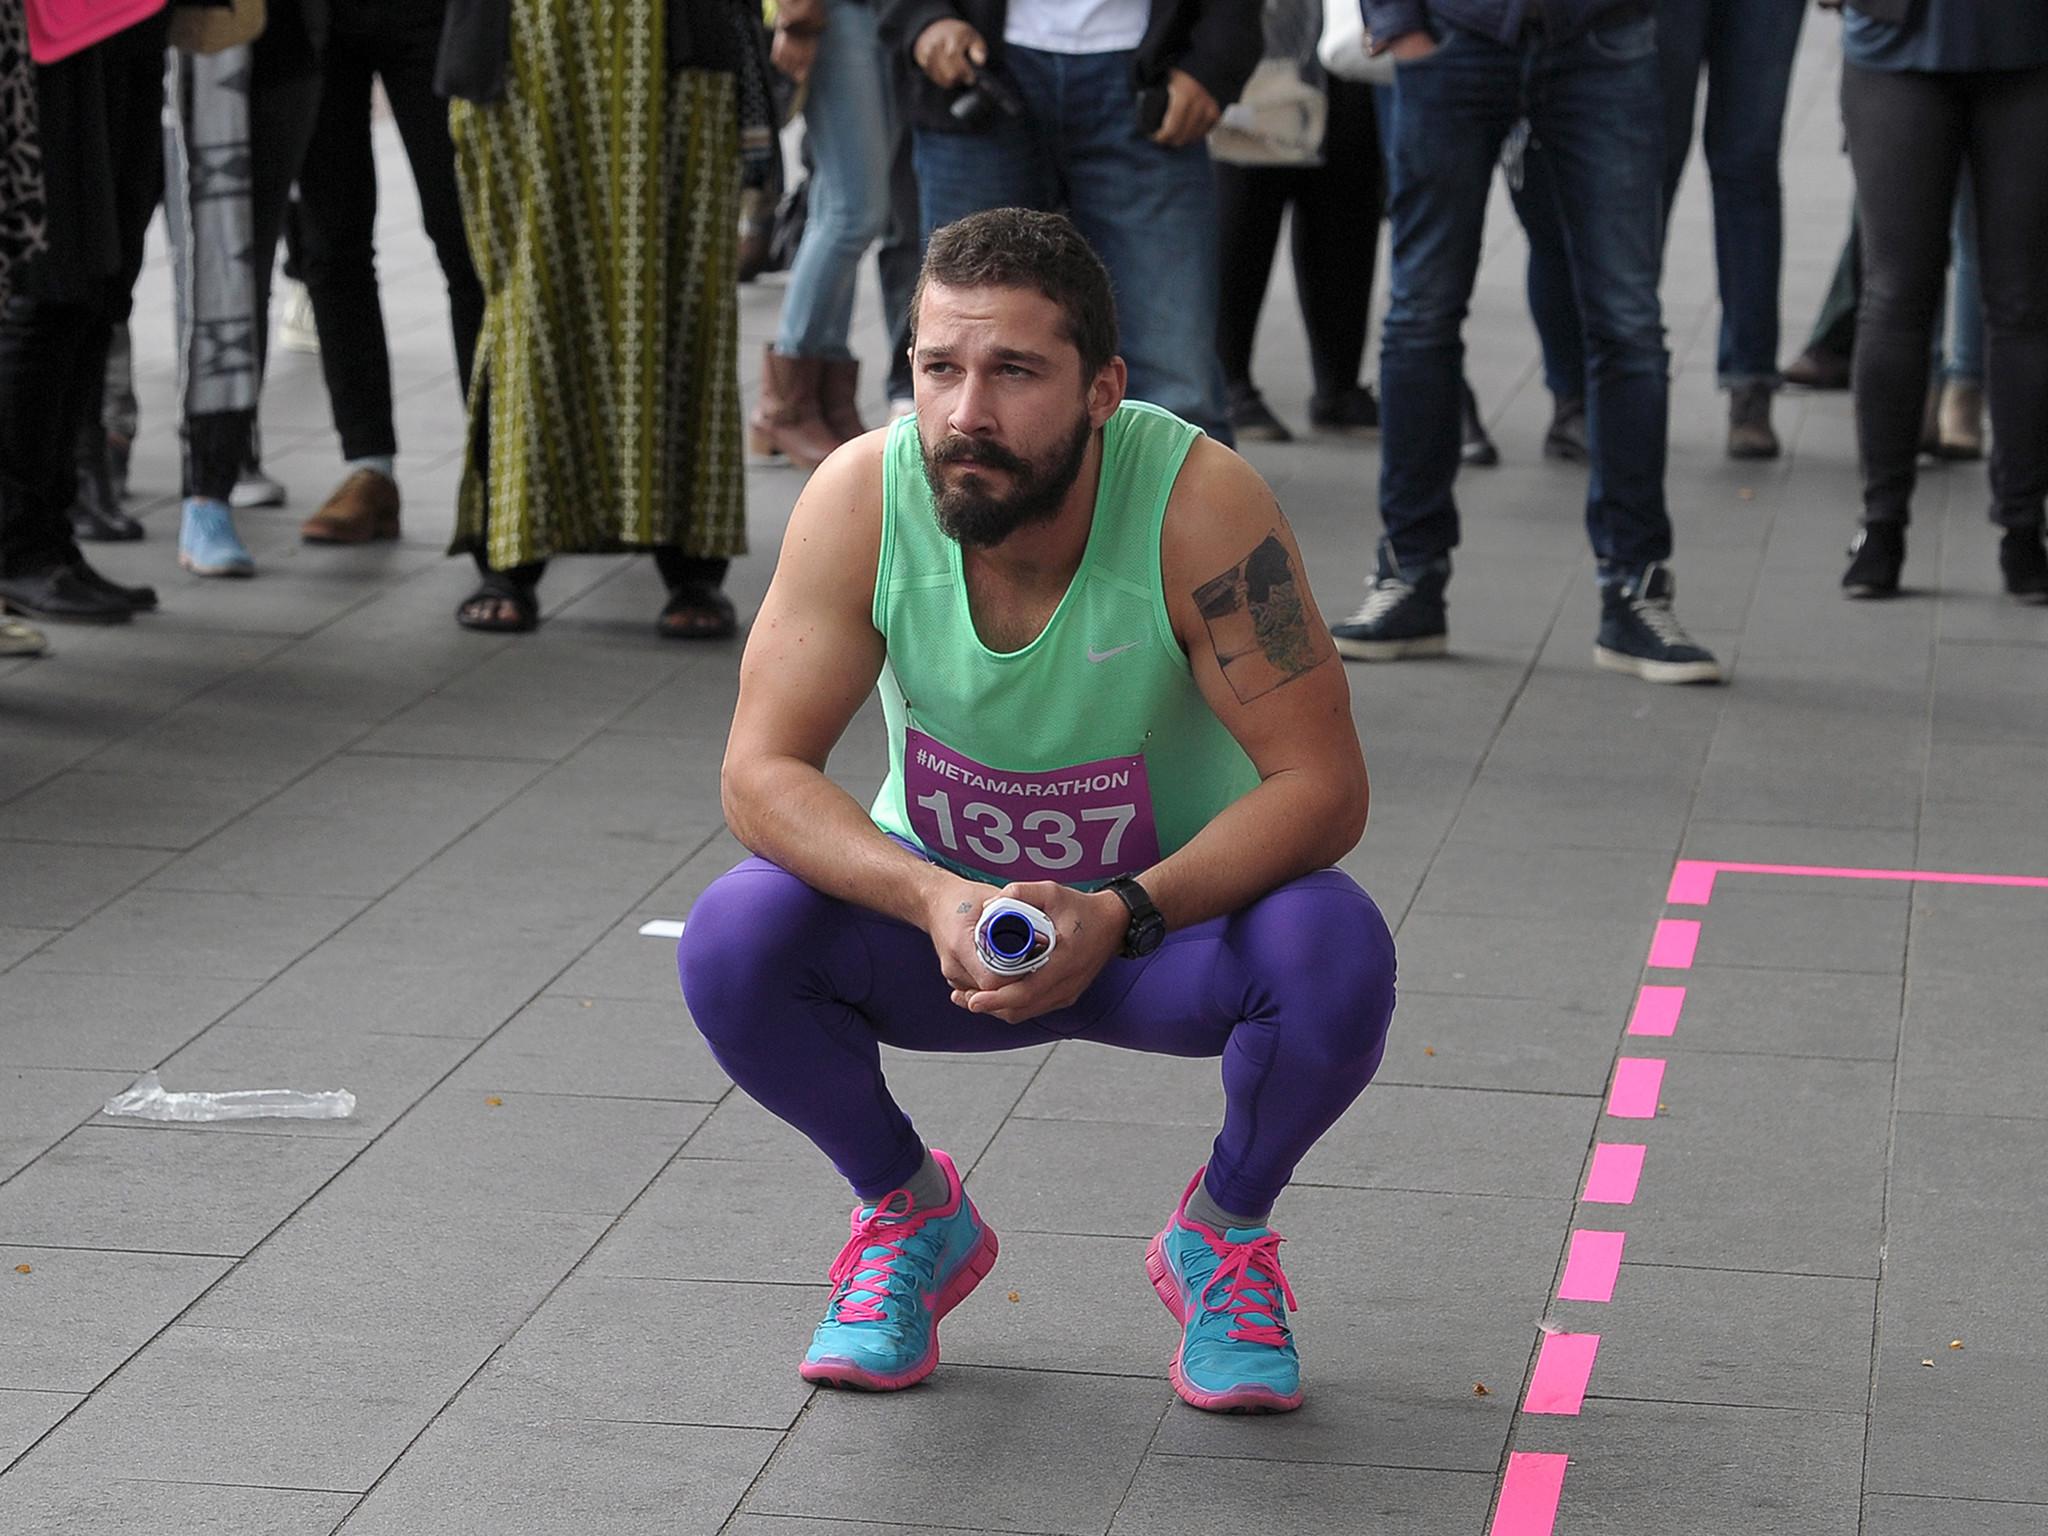 Shia LaBeouf runs around Amsterdam museum 144 times for bizarre art  '#metamarathon' | The Independent